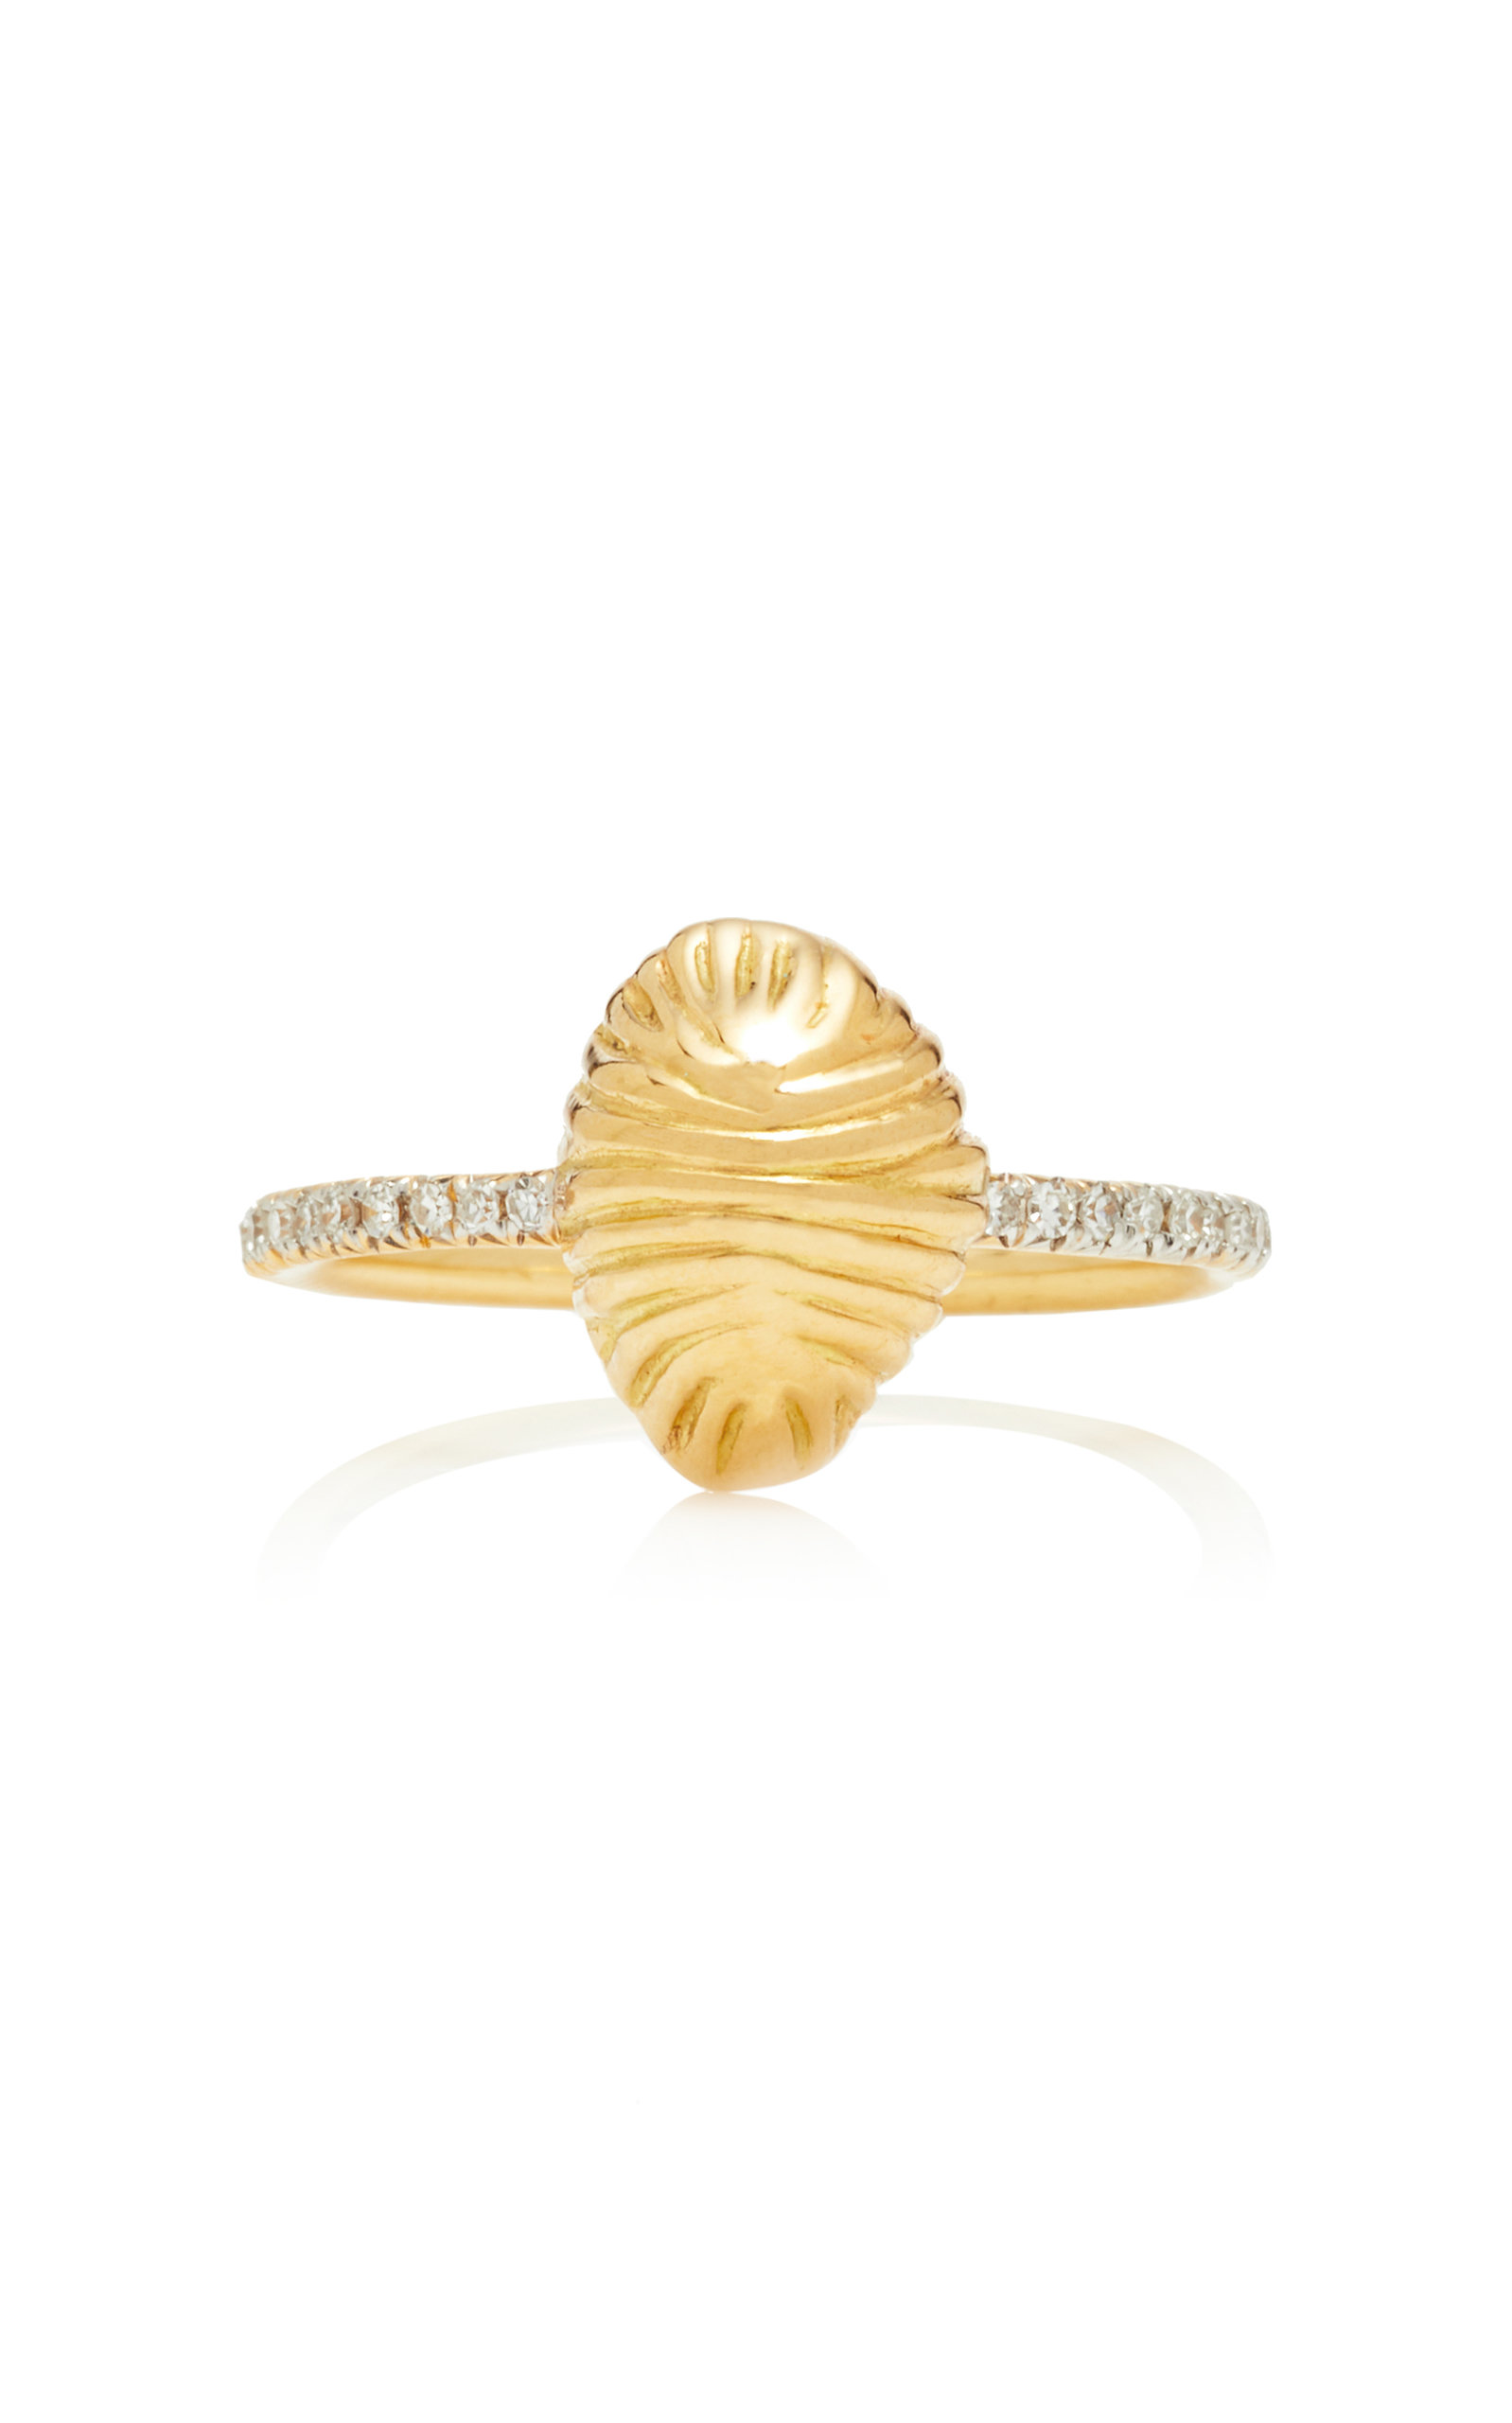 RENNA SMALL THREAD AND SHELL DIAMOND RING